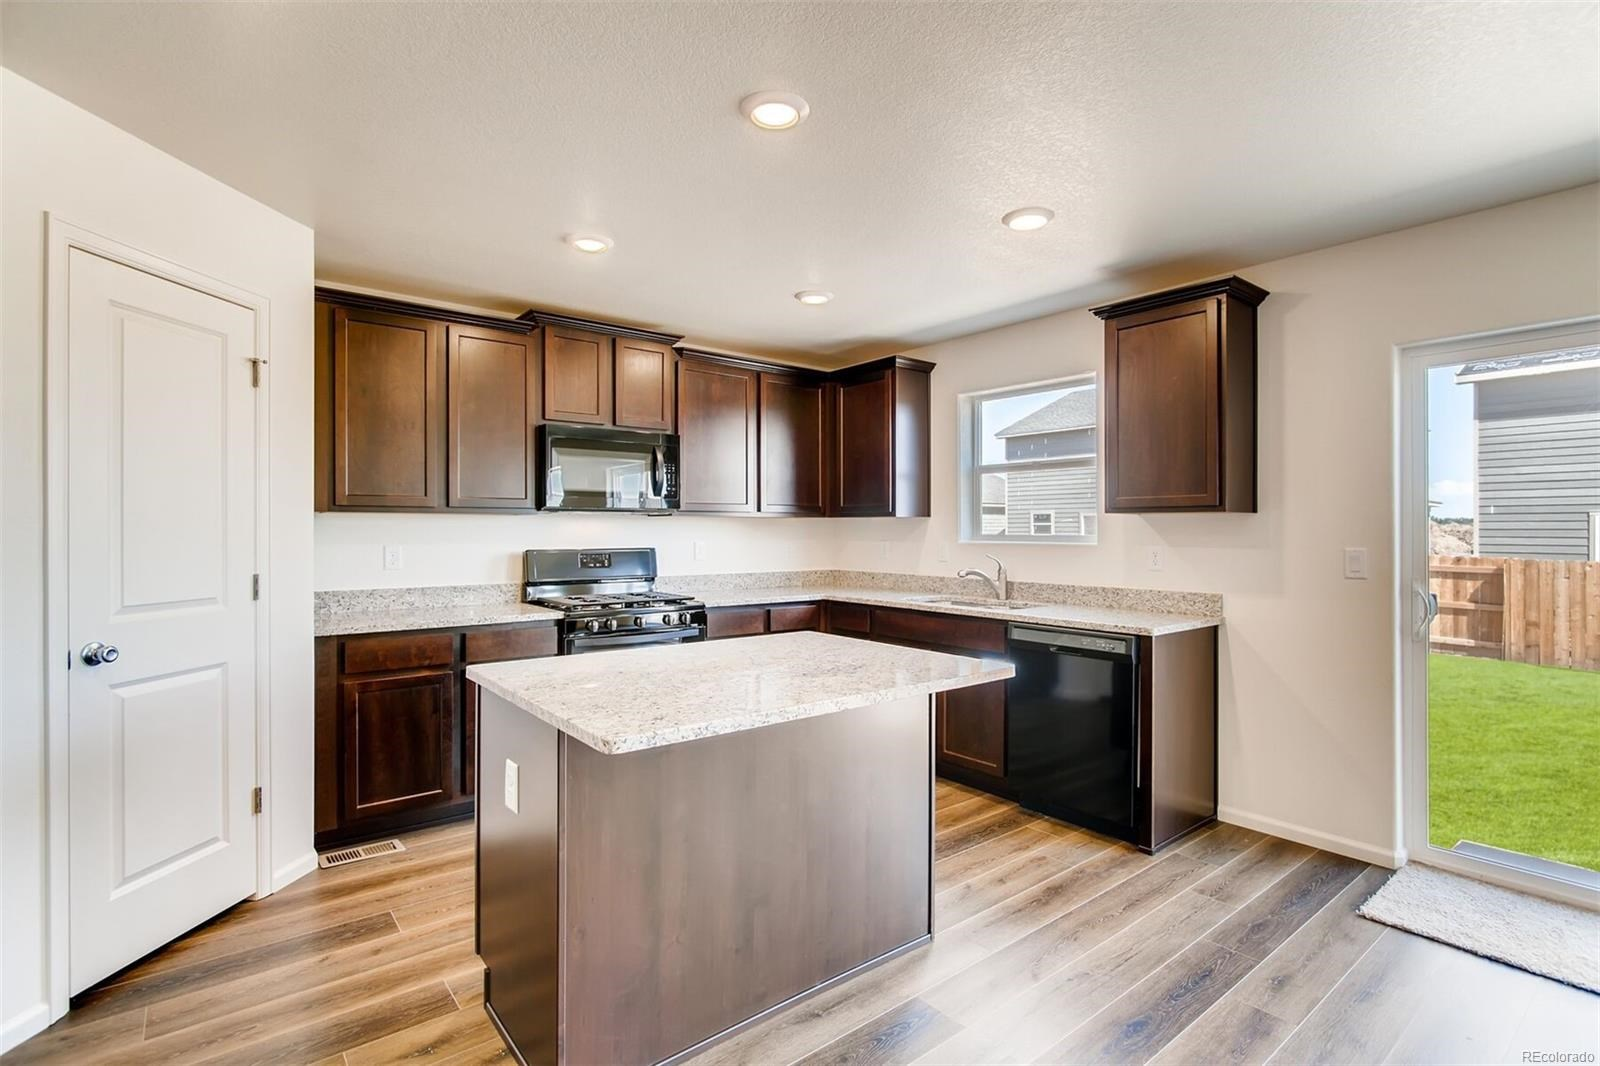 MLS# 8392455 - 3 - 221 Mesa Avenue, Lochbuie, CO 80603